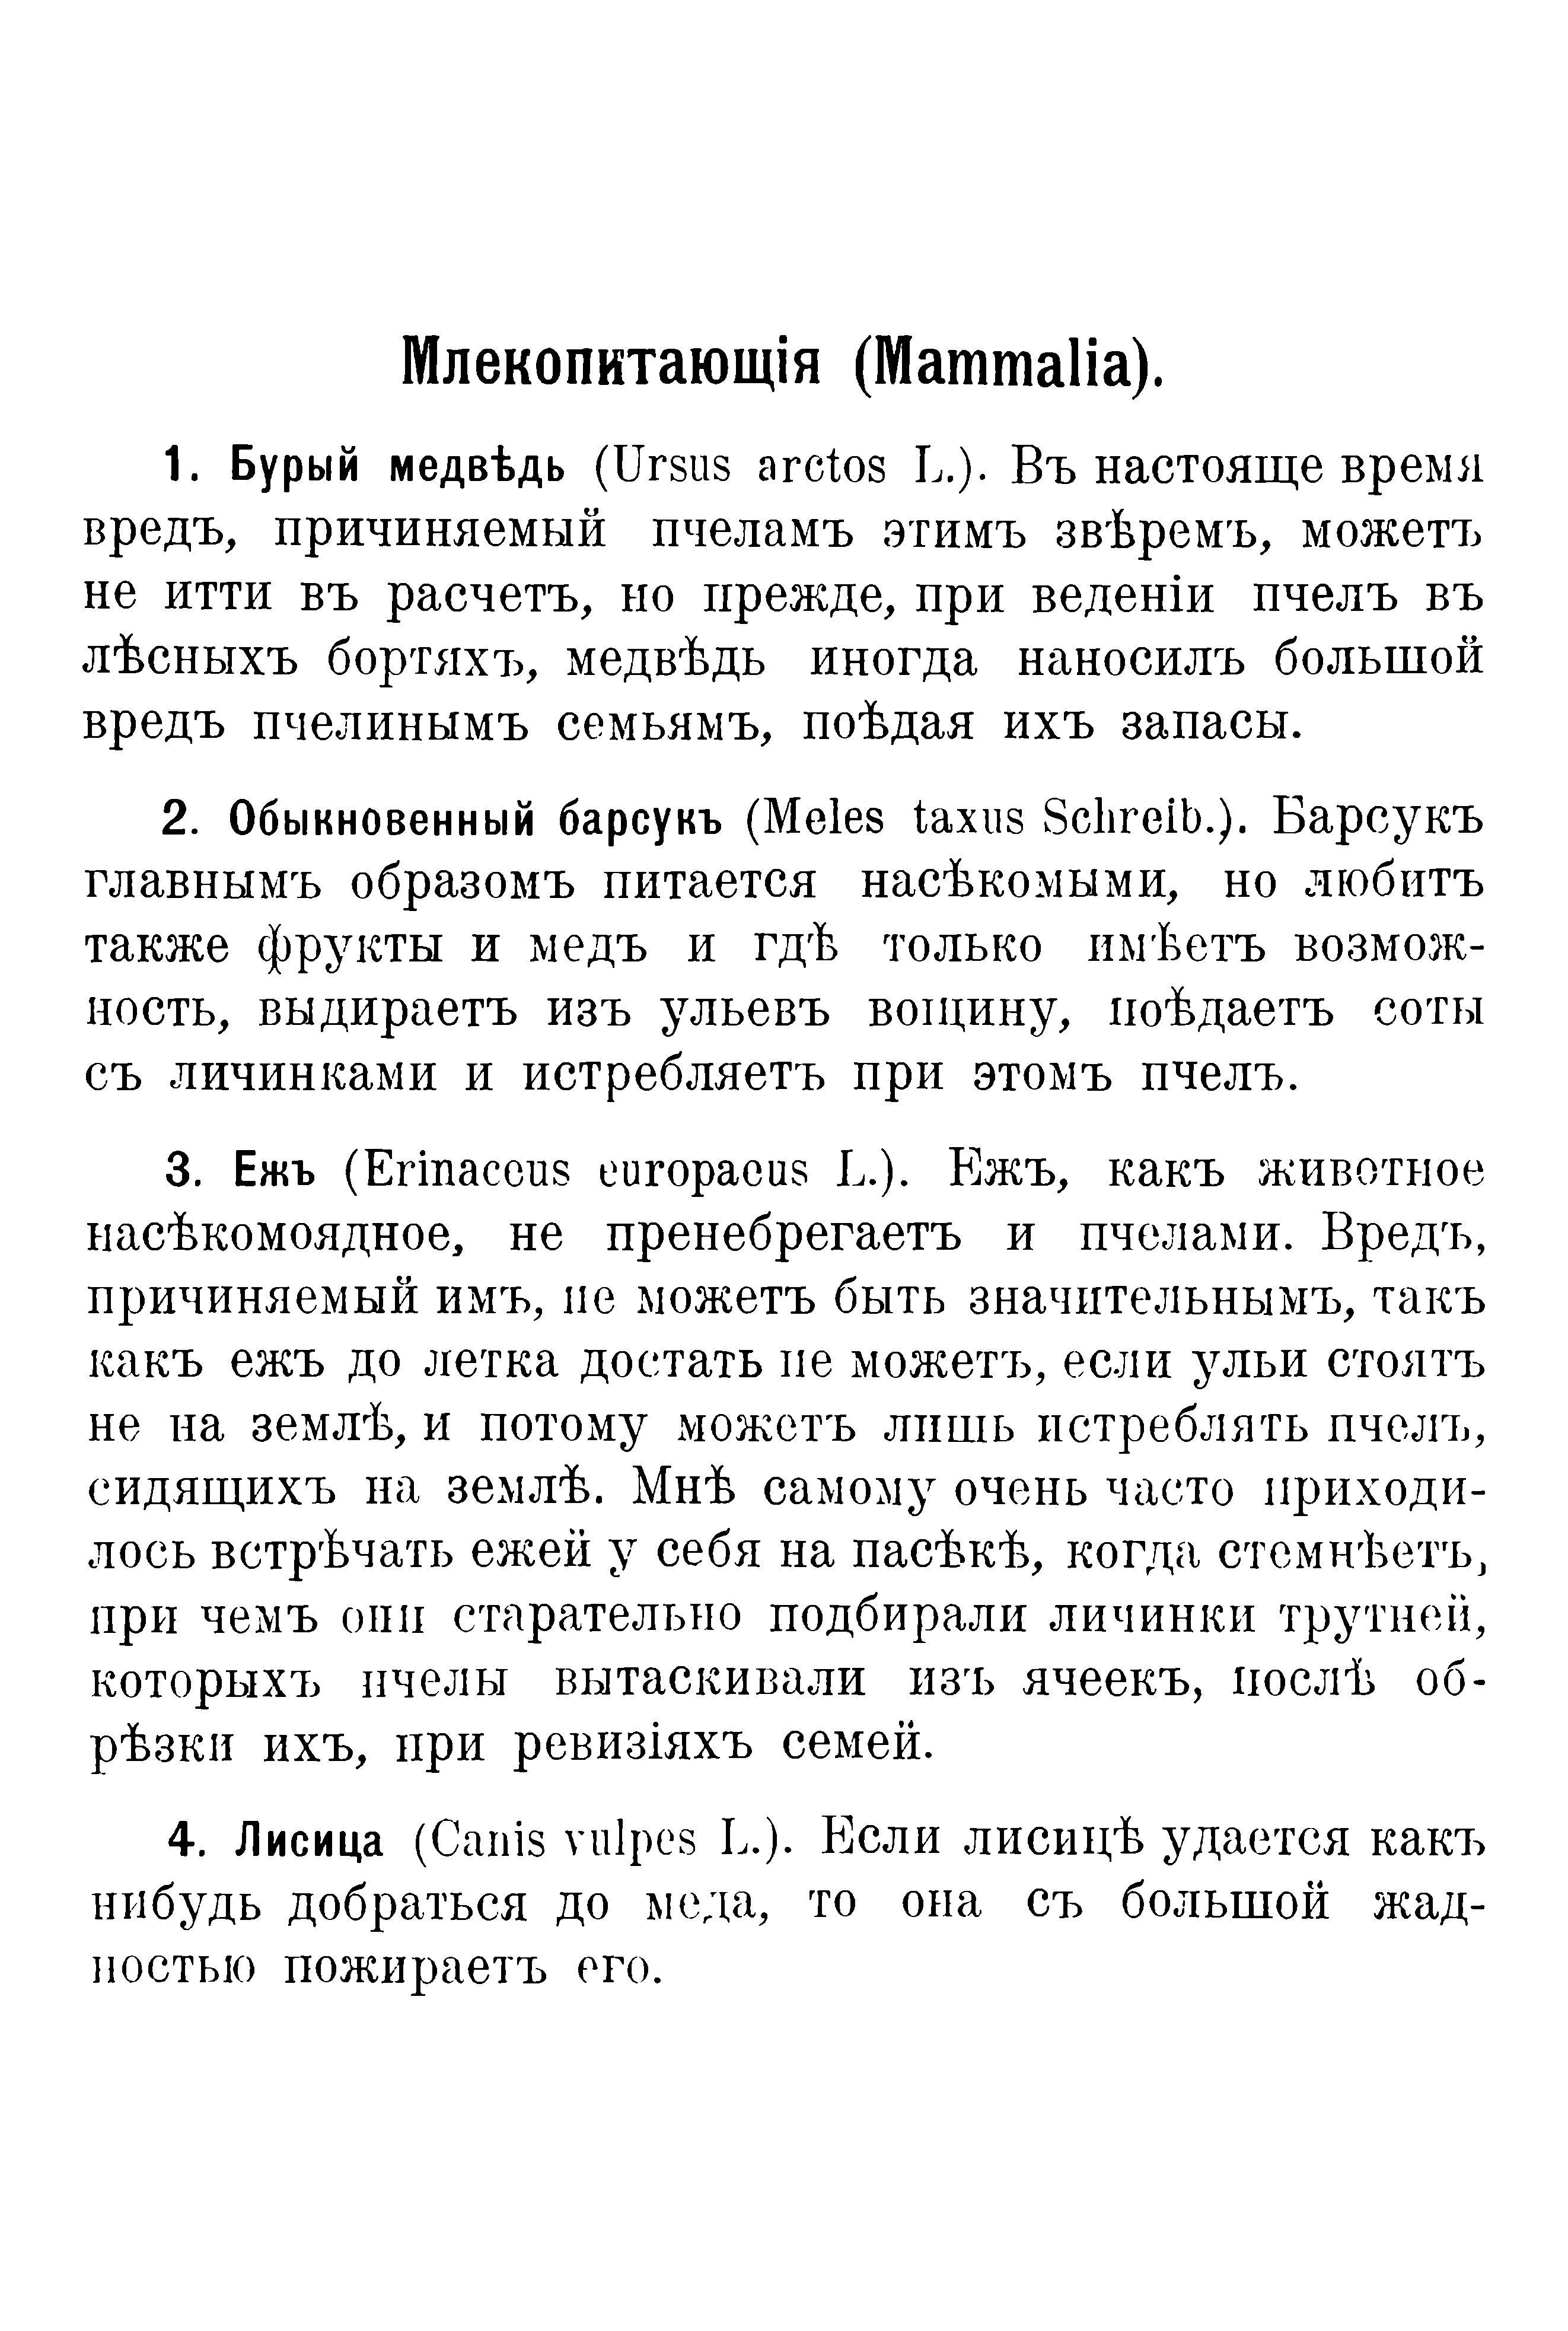 Враги пчёл - А.Г.Белявский 1.jpg